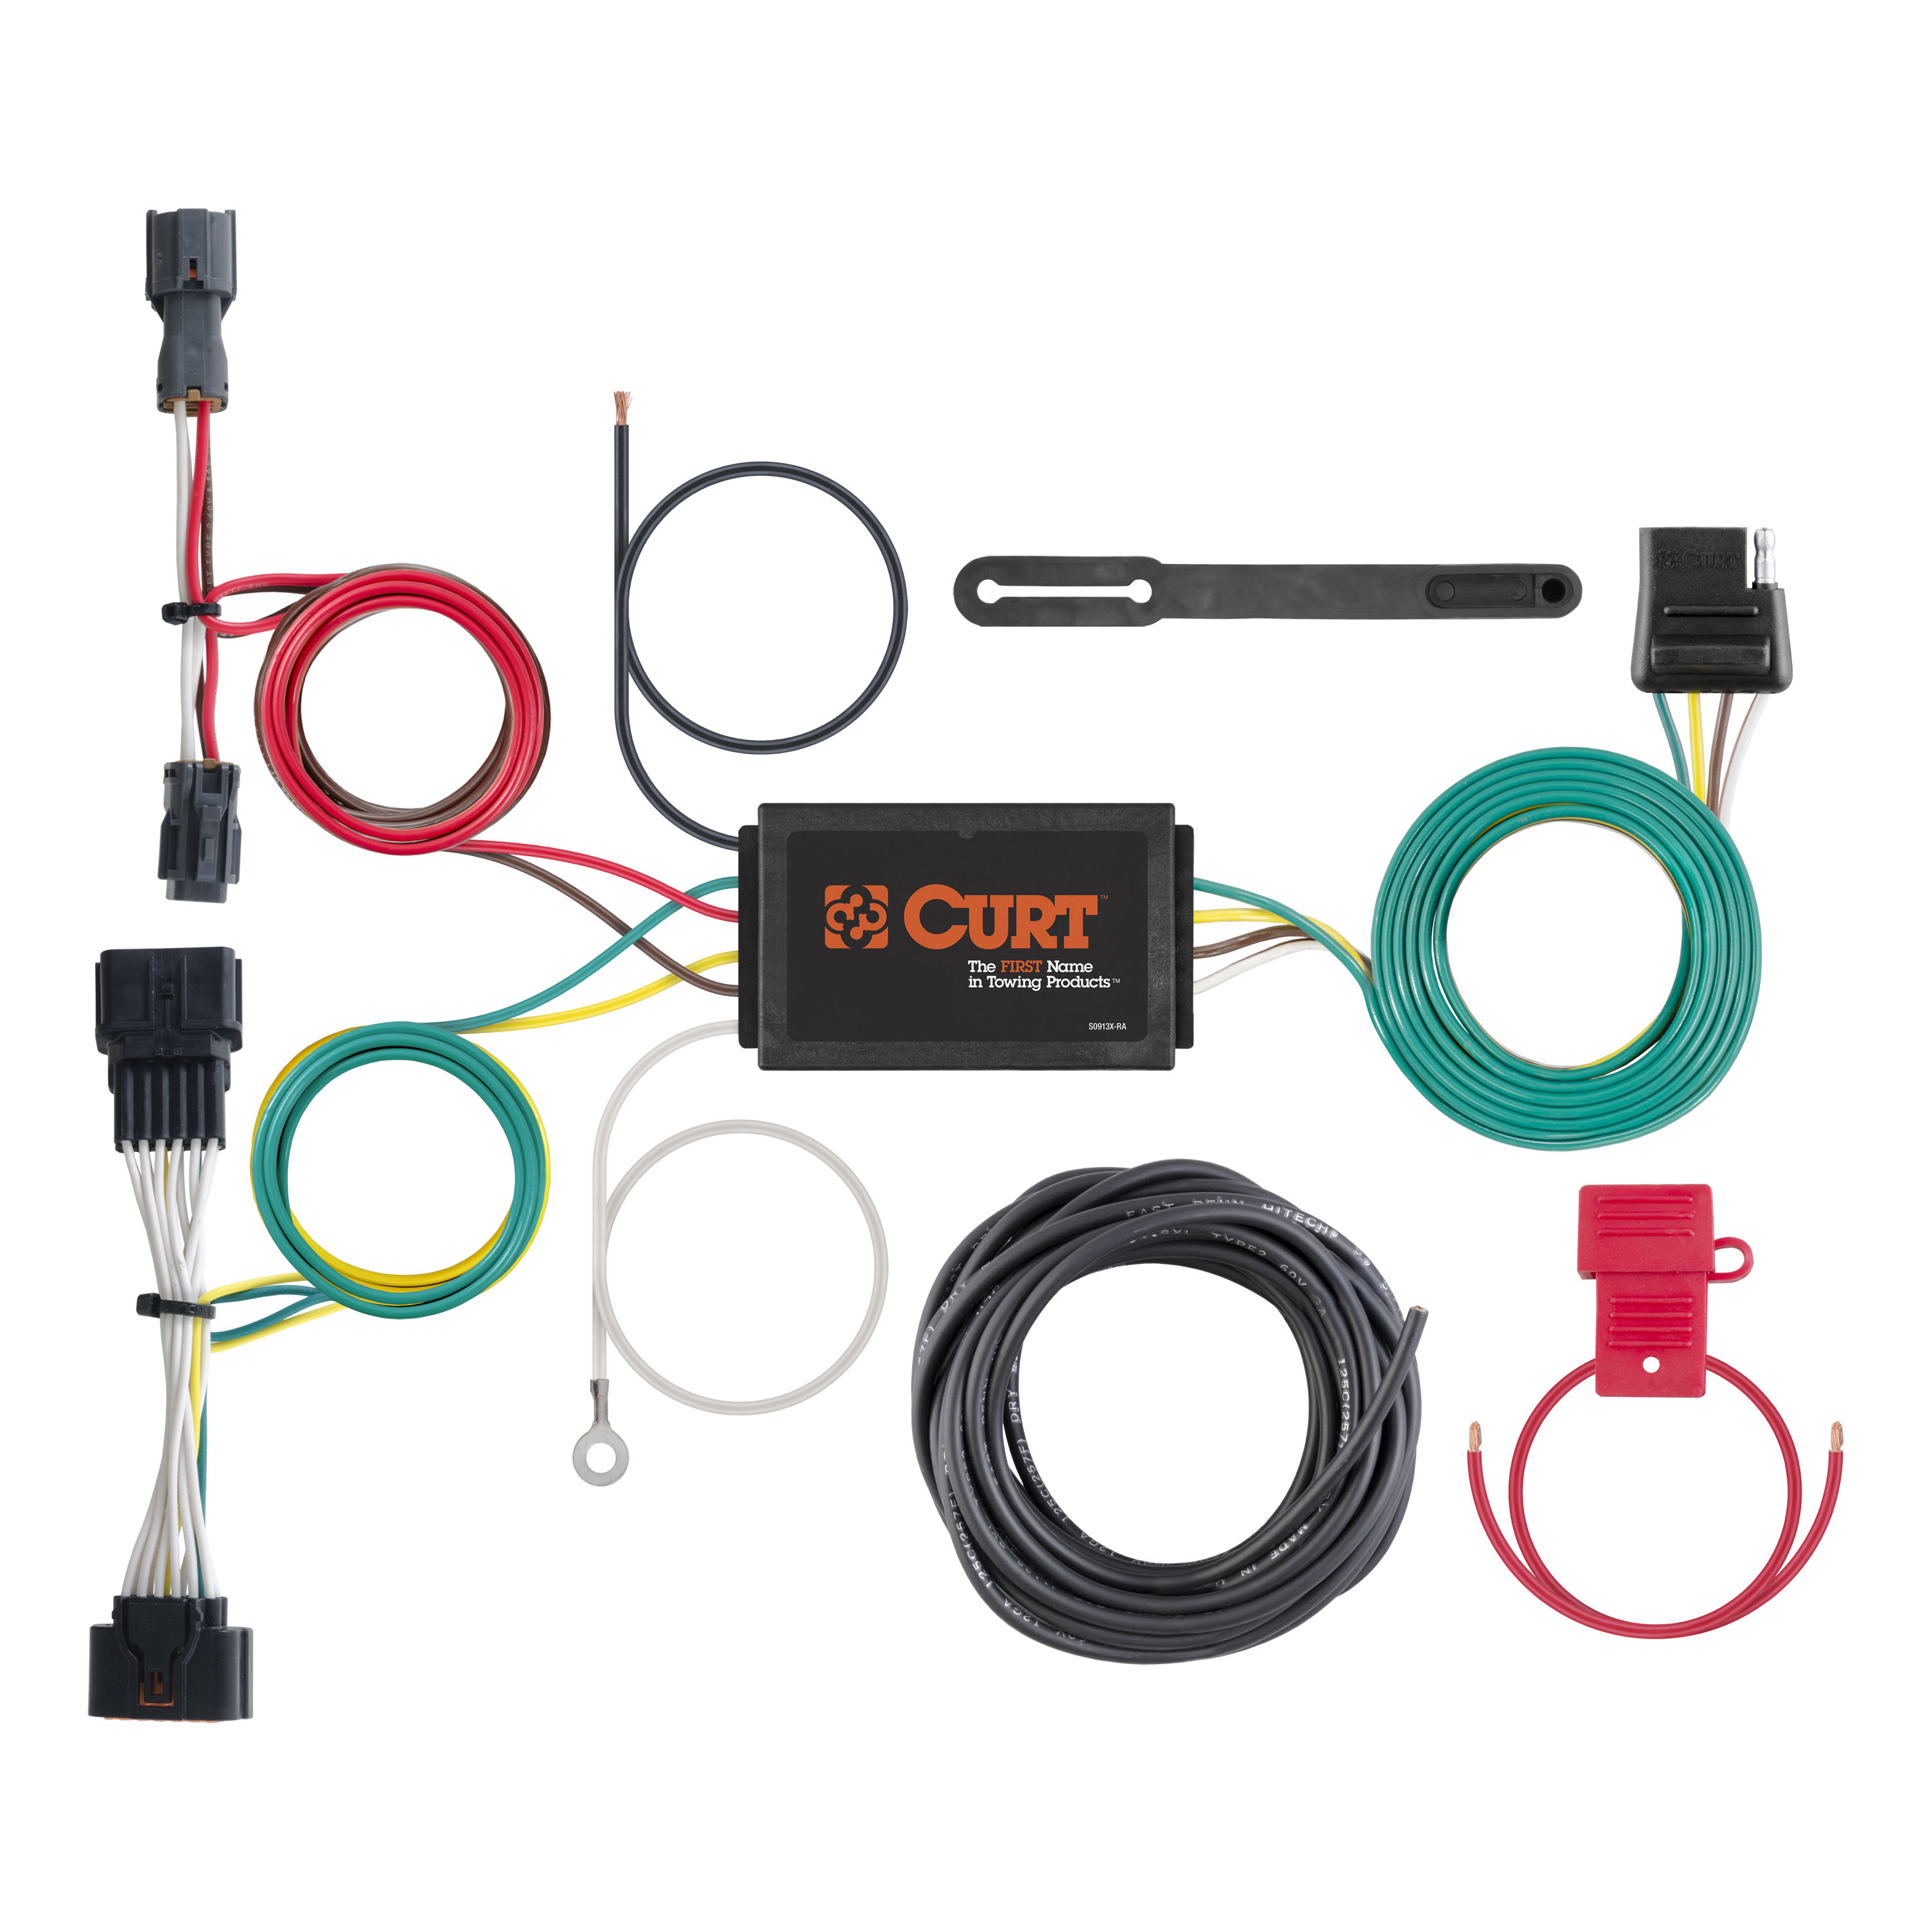 curt 56321 custom wiring harness for 17 kia sportage ebay 2000 kia sportage wiring harness image is loading curt 56321 custom wiring harness for 17 kia